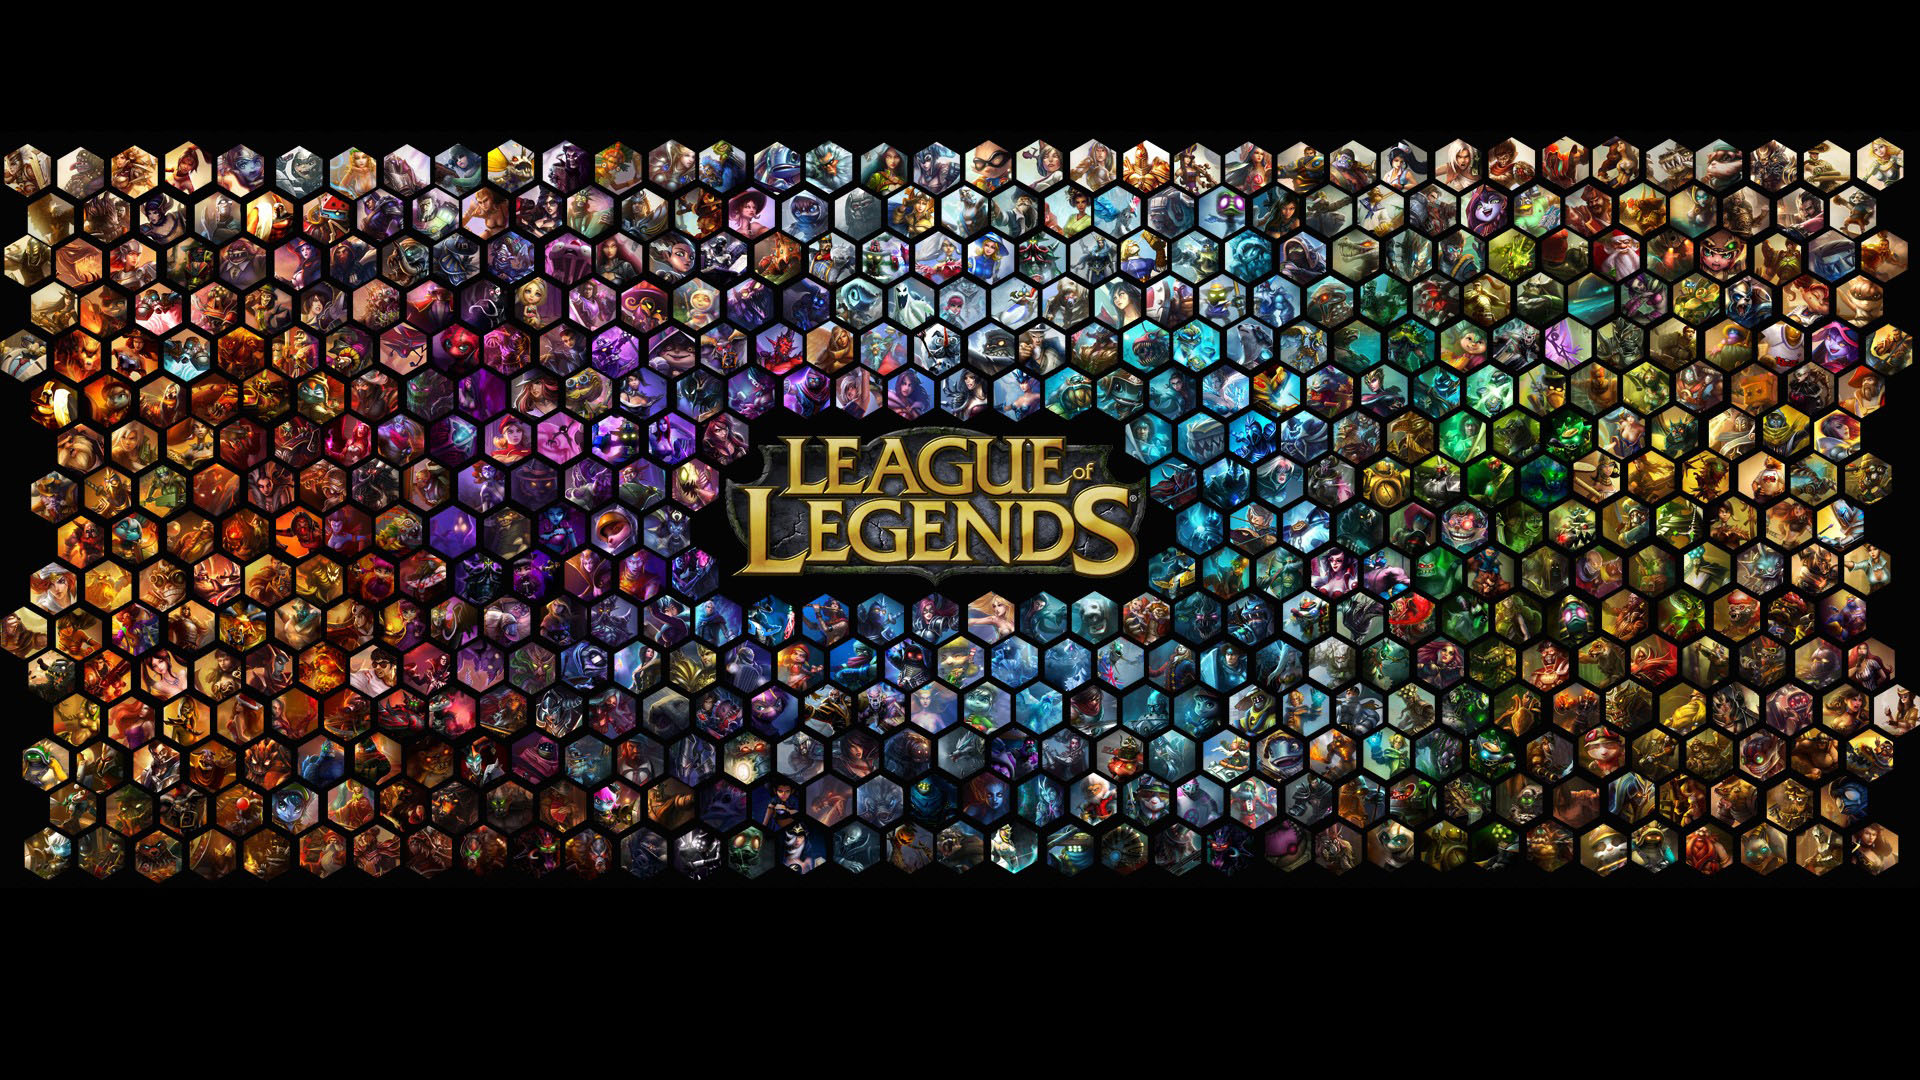 League of Legends Hero Cells HD Wallpaper FullHDWpp   Full HD 1920x1080